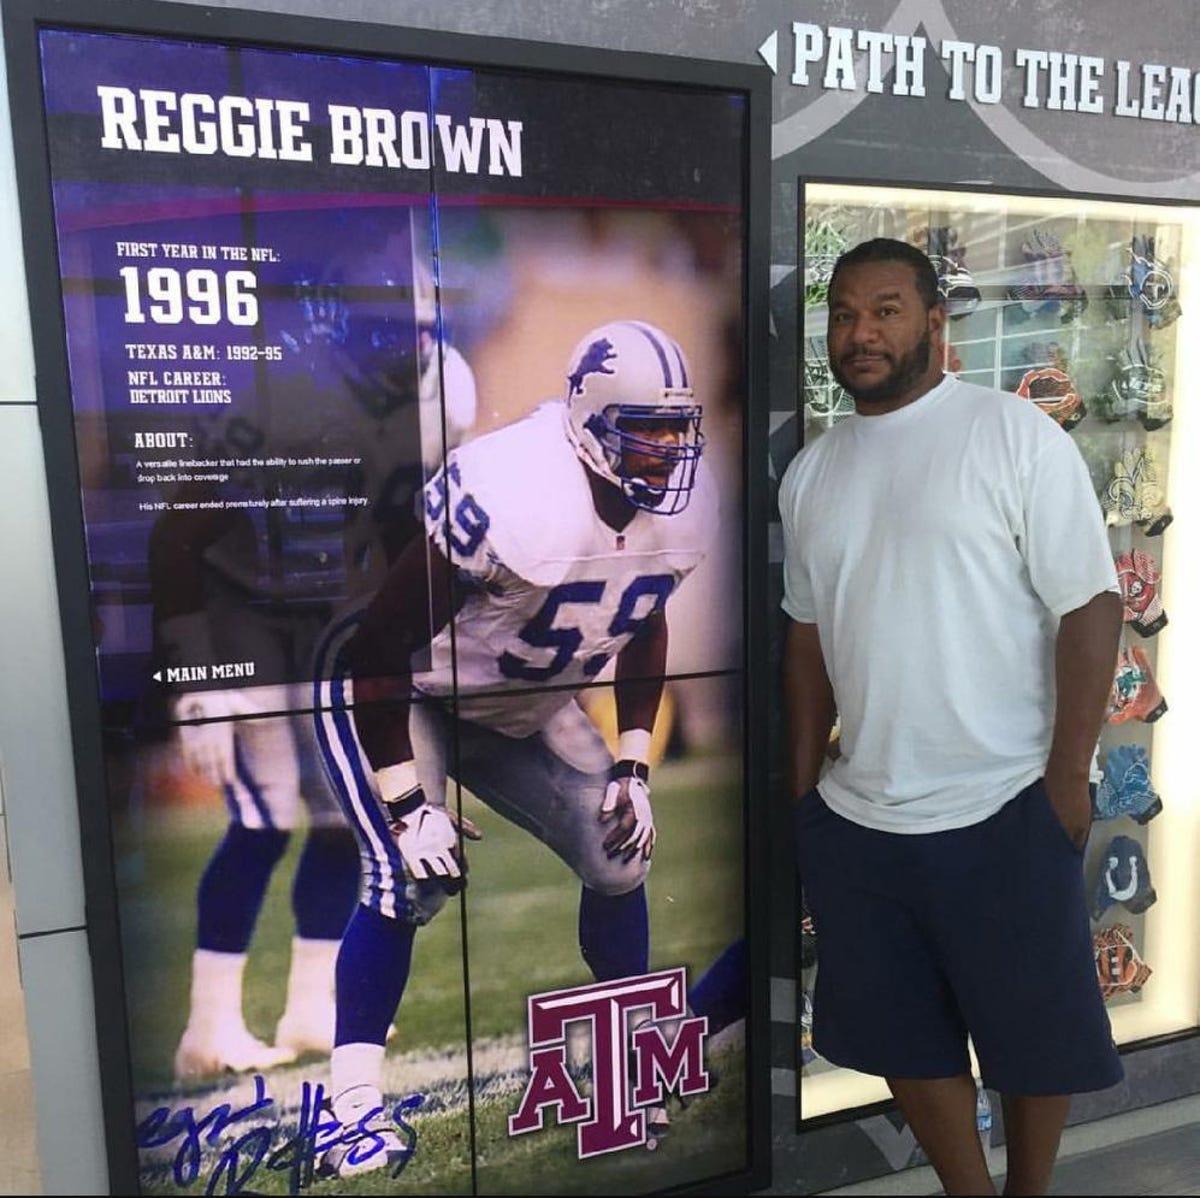 He's not breathing': Ex-Lion Reggie Brown recalls fateful day